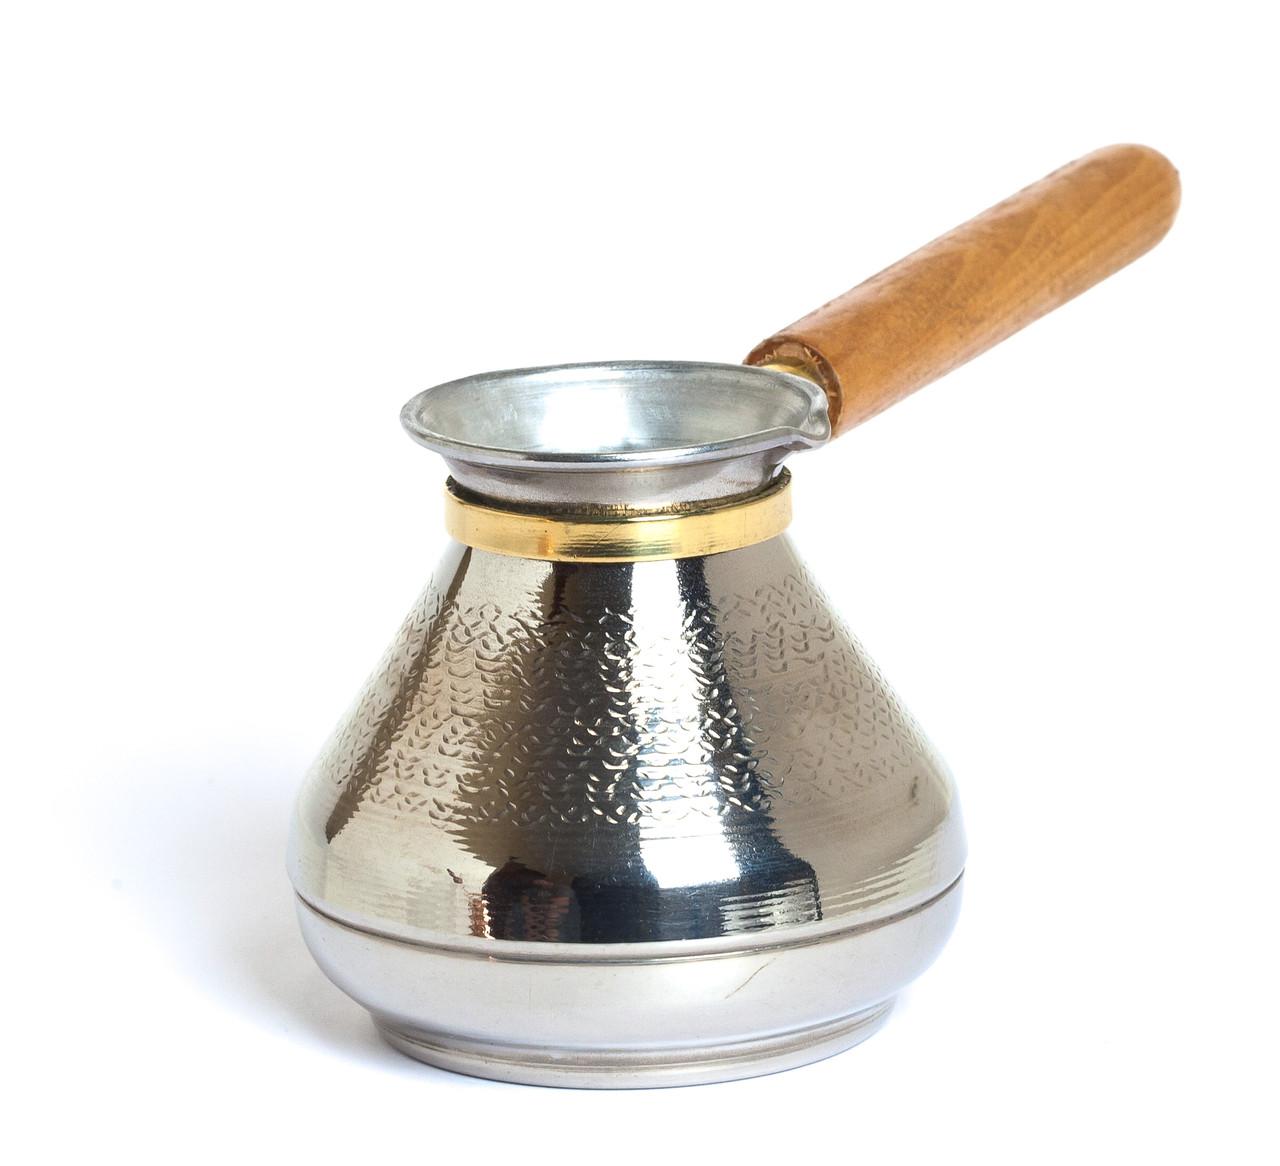 Турка медная Ладья (120мл) серебро